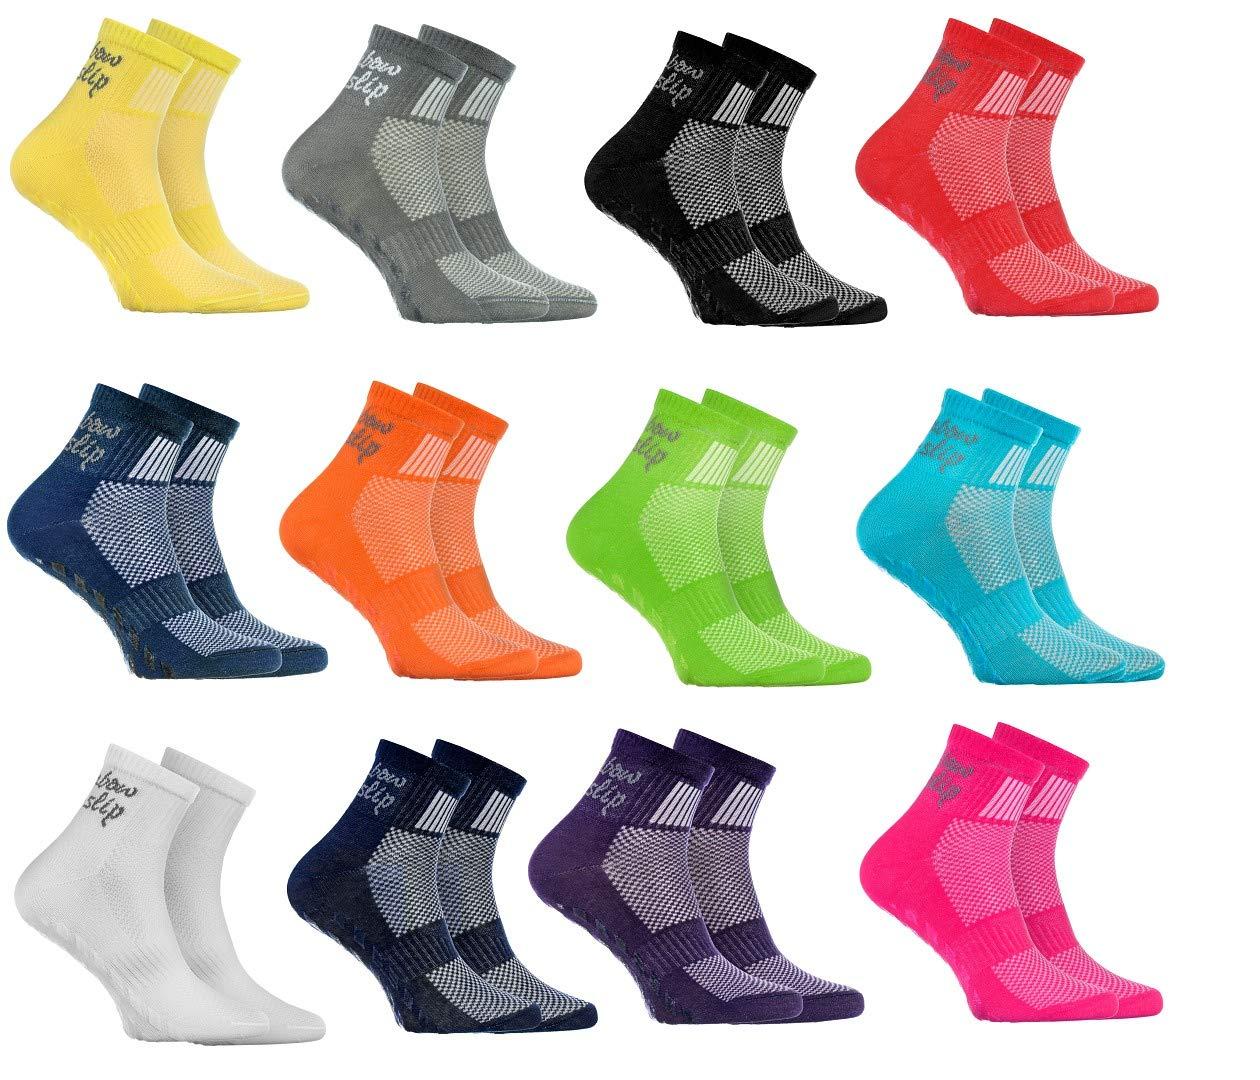 Rainbow Socks Hombre Mujer Deporte Calcetines Antideslizantes ABS de Algod/ón